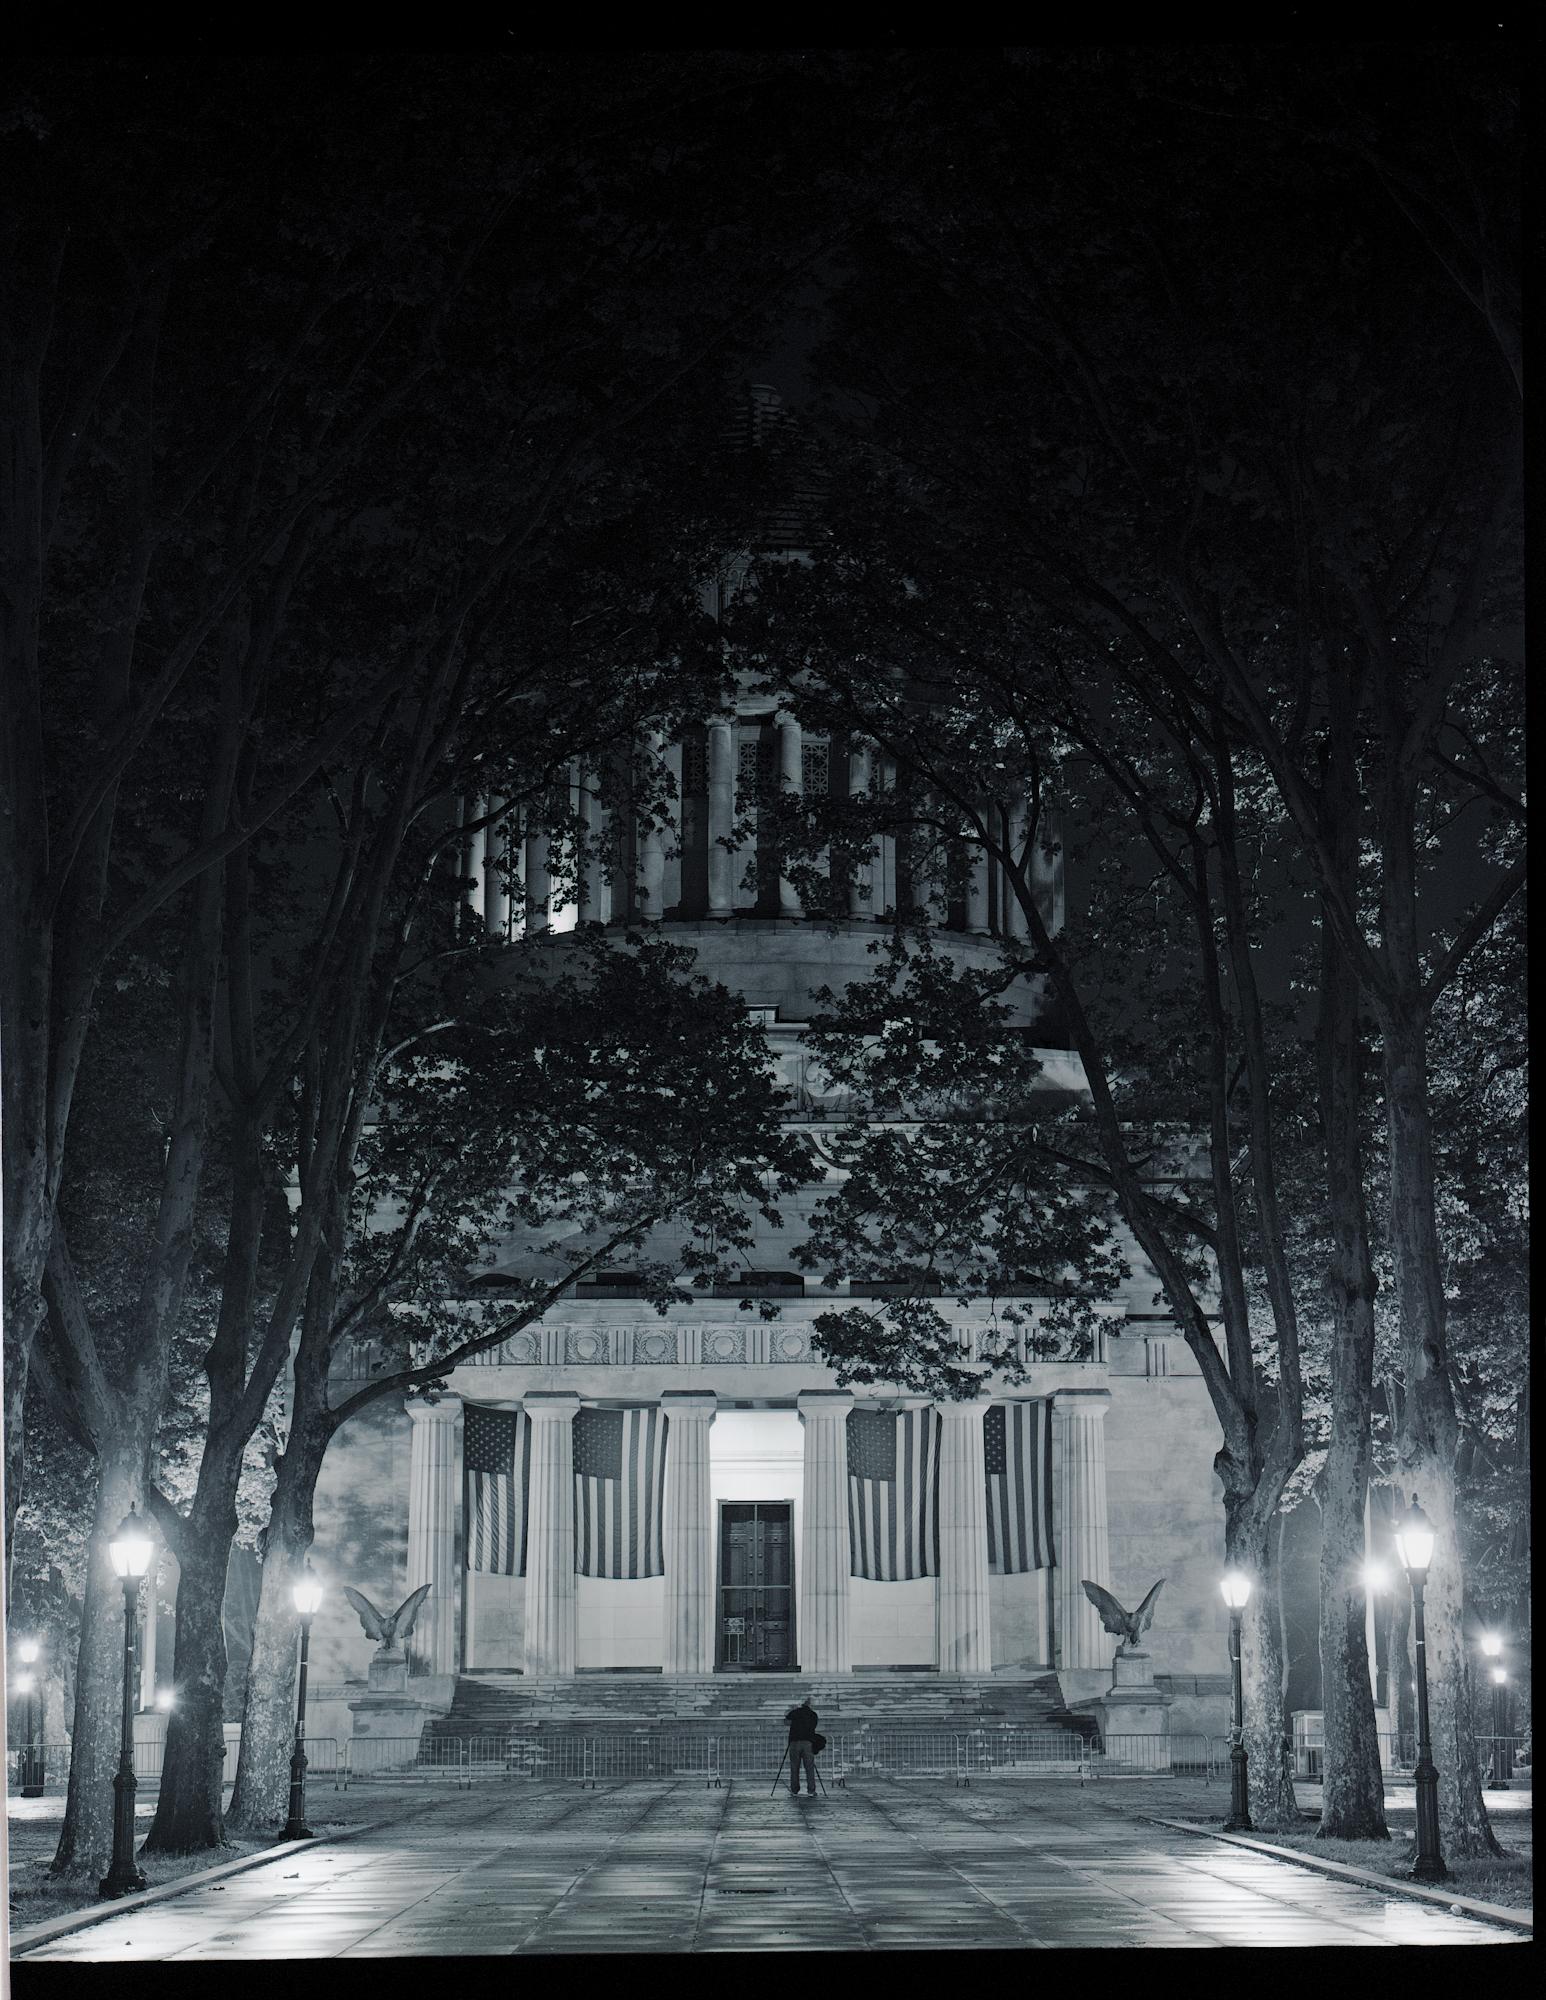 grants_tomb-1